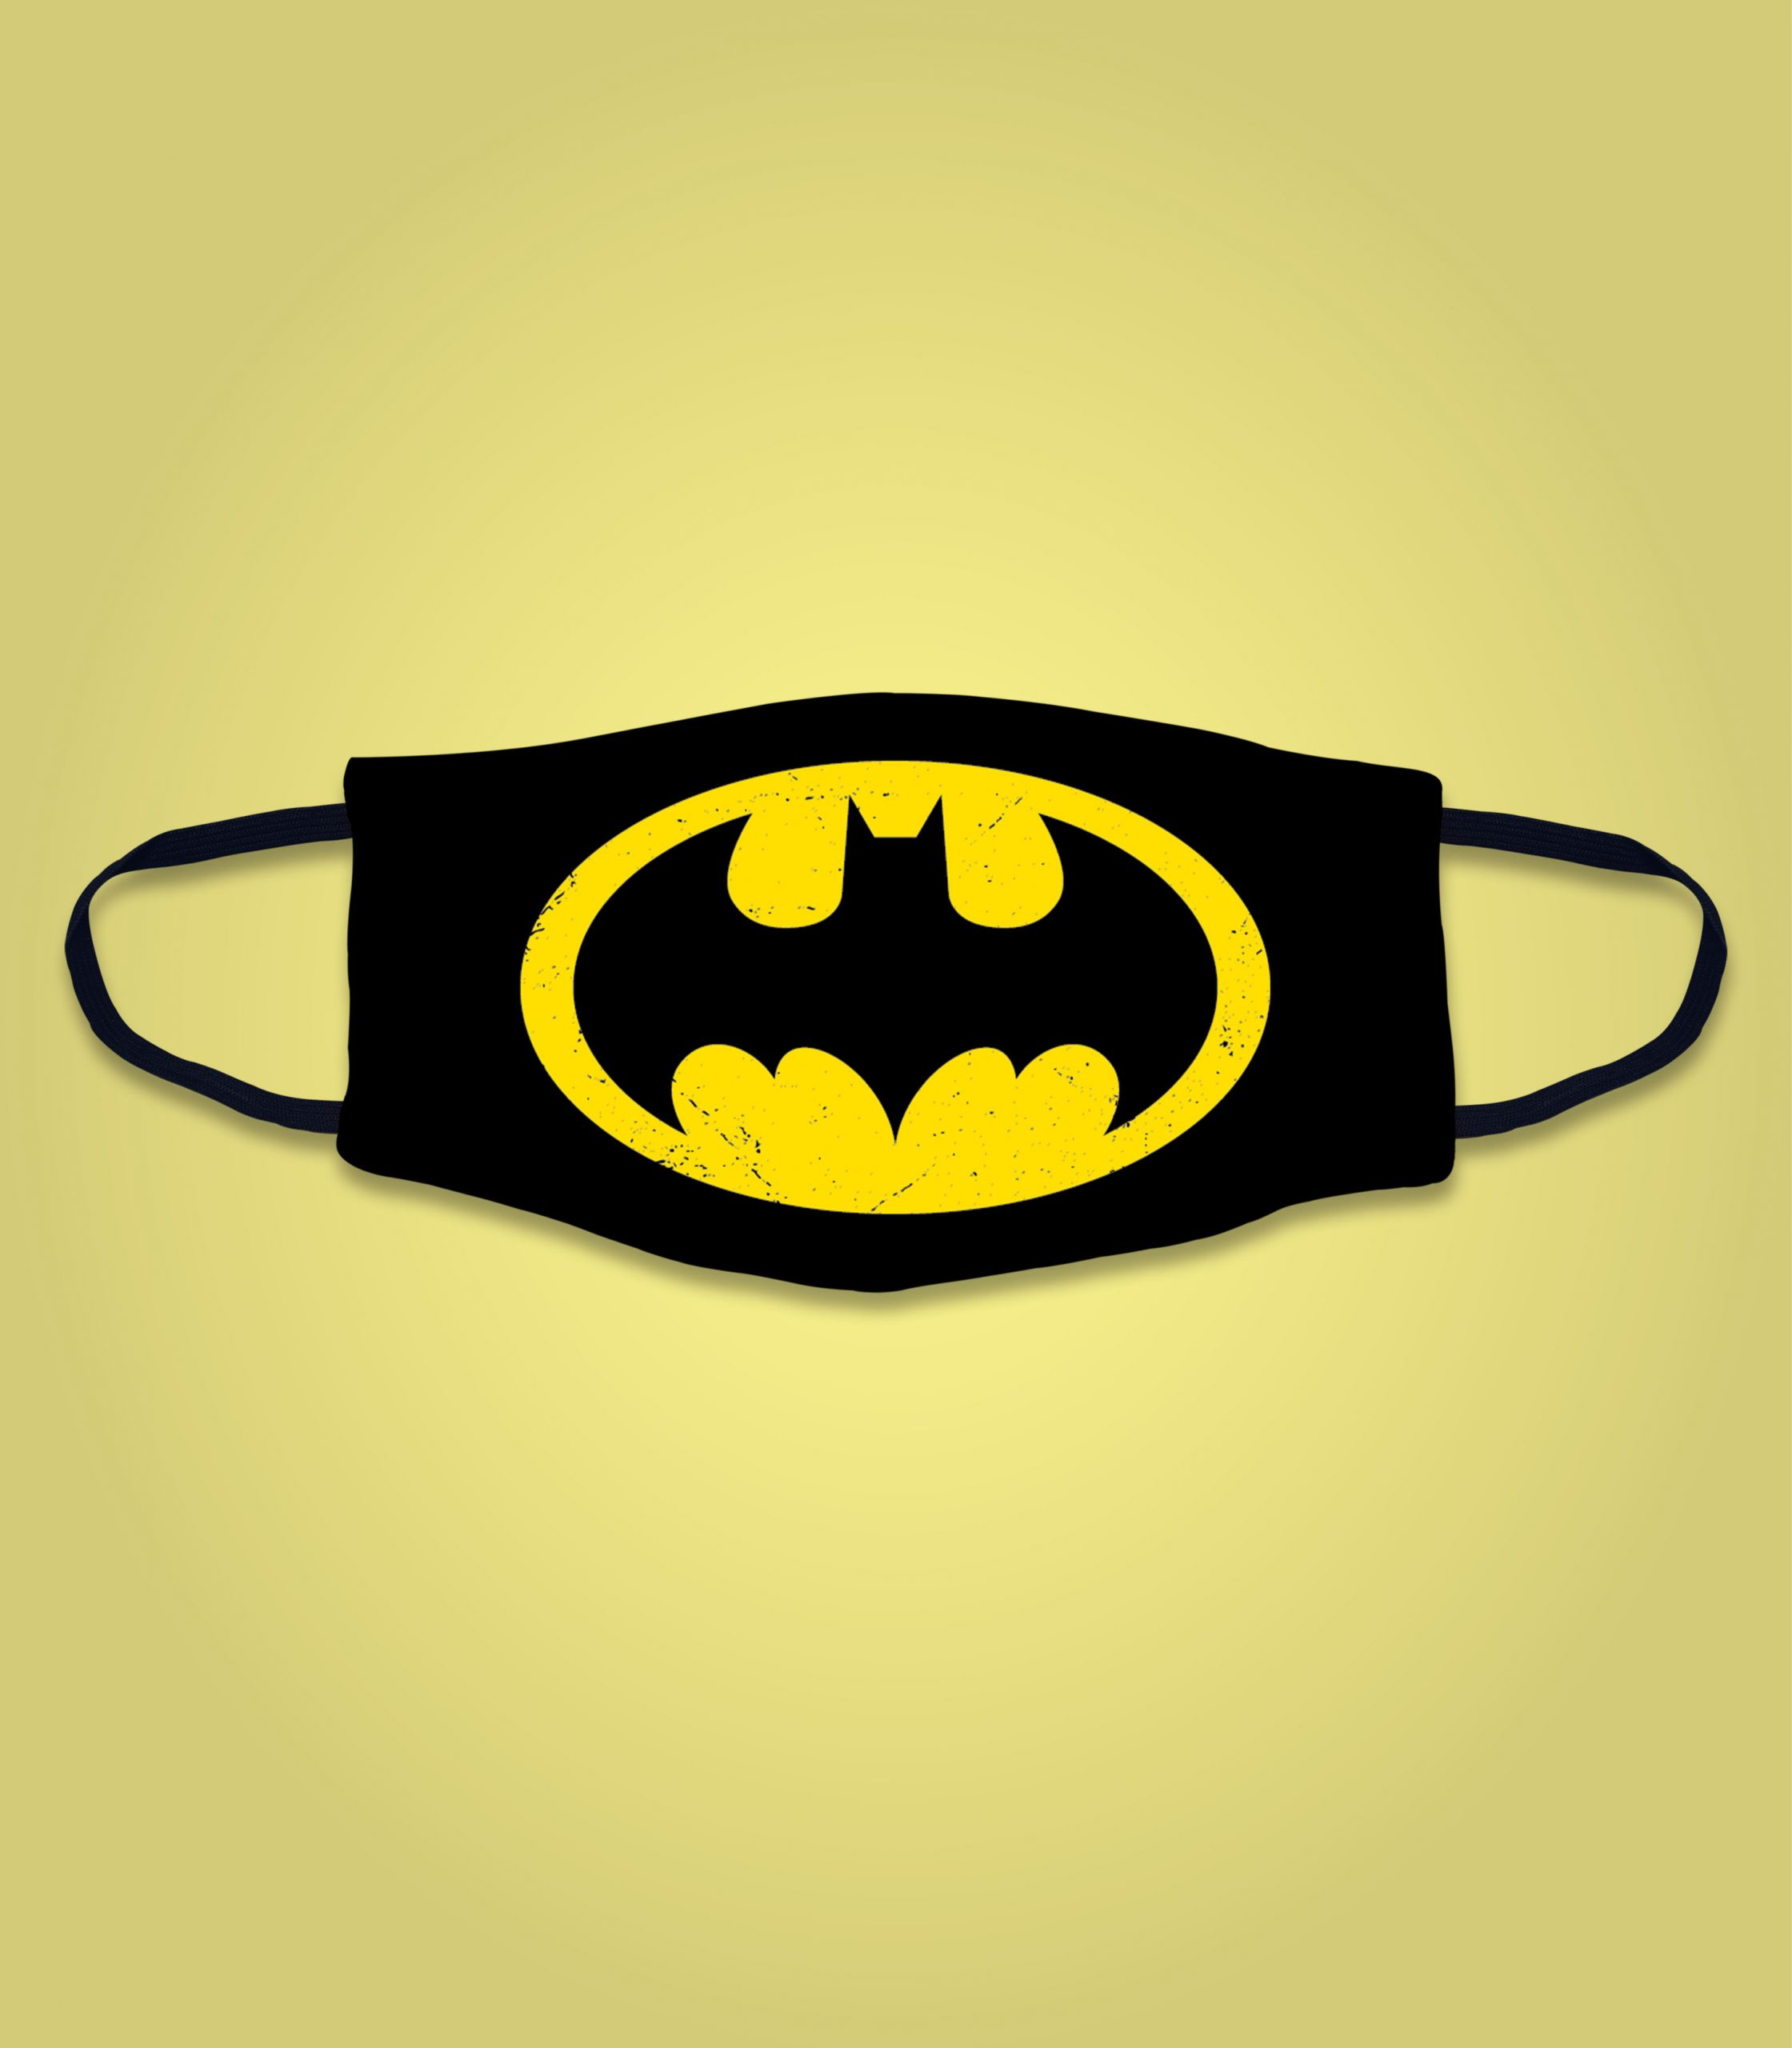 02 Batman product image-01.jpg 2